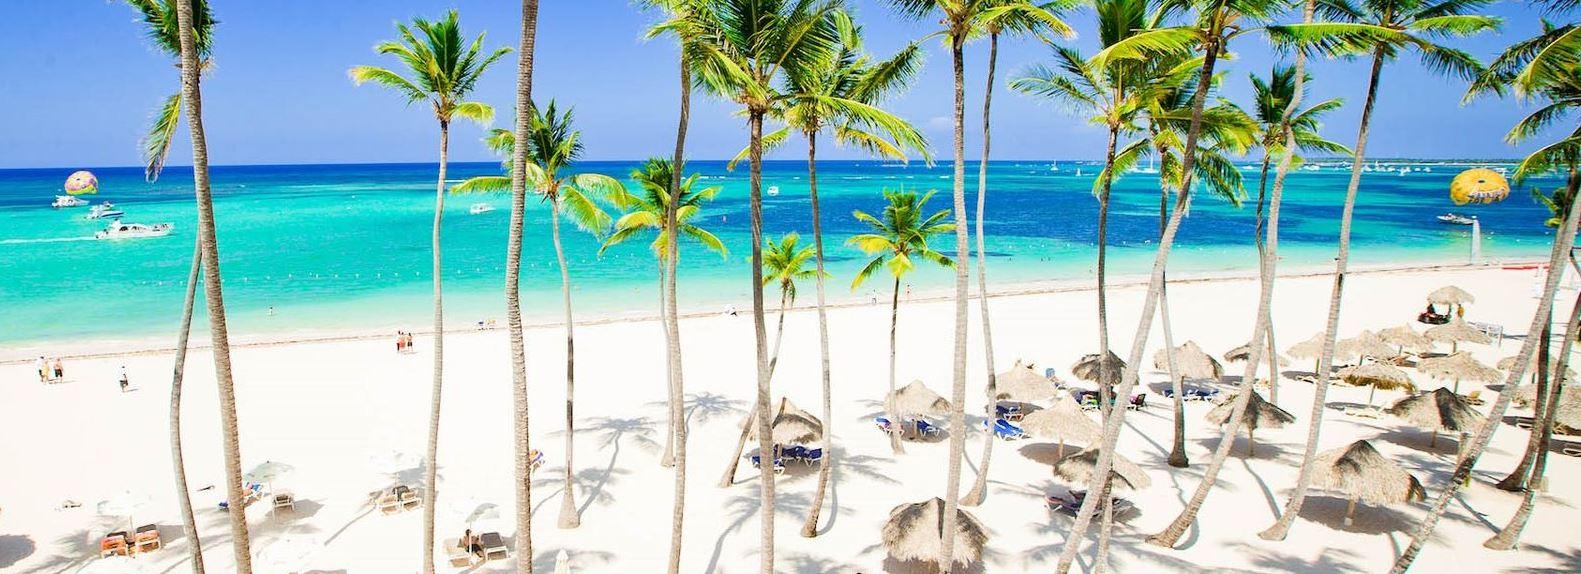 Playa de Macao en Punta Cana Republica Dominicana